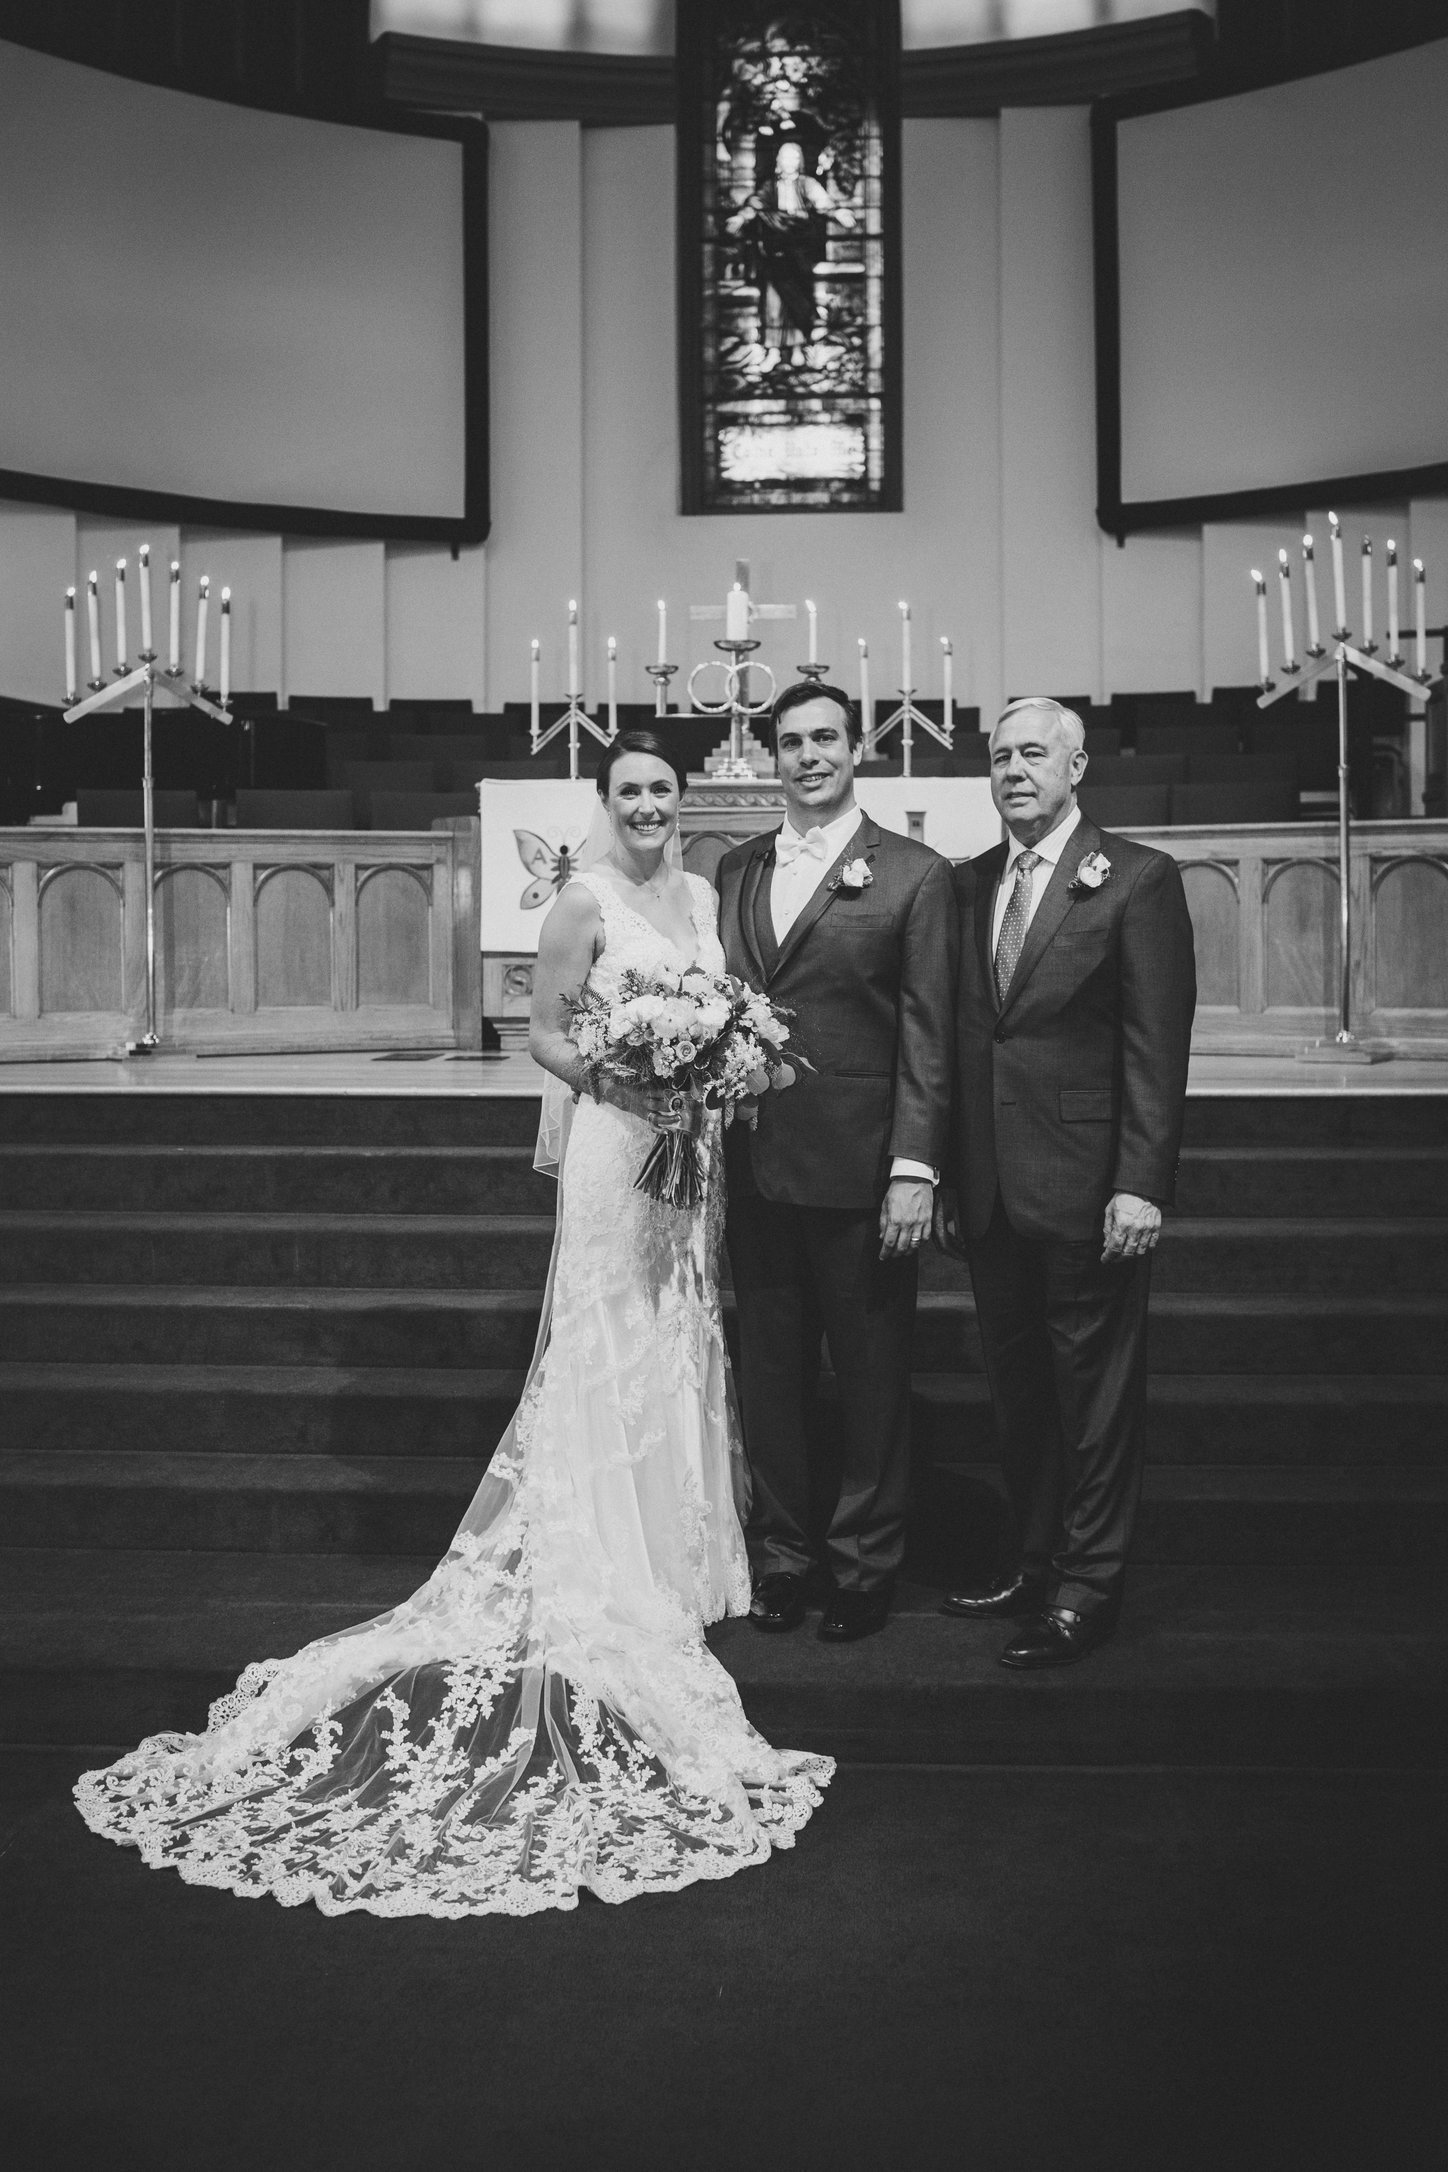 SandC-wedding-258.jpg